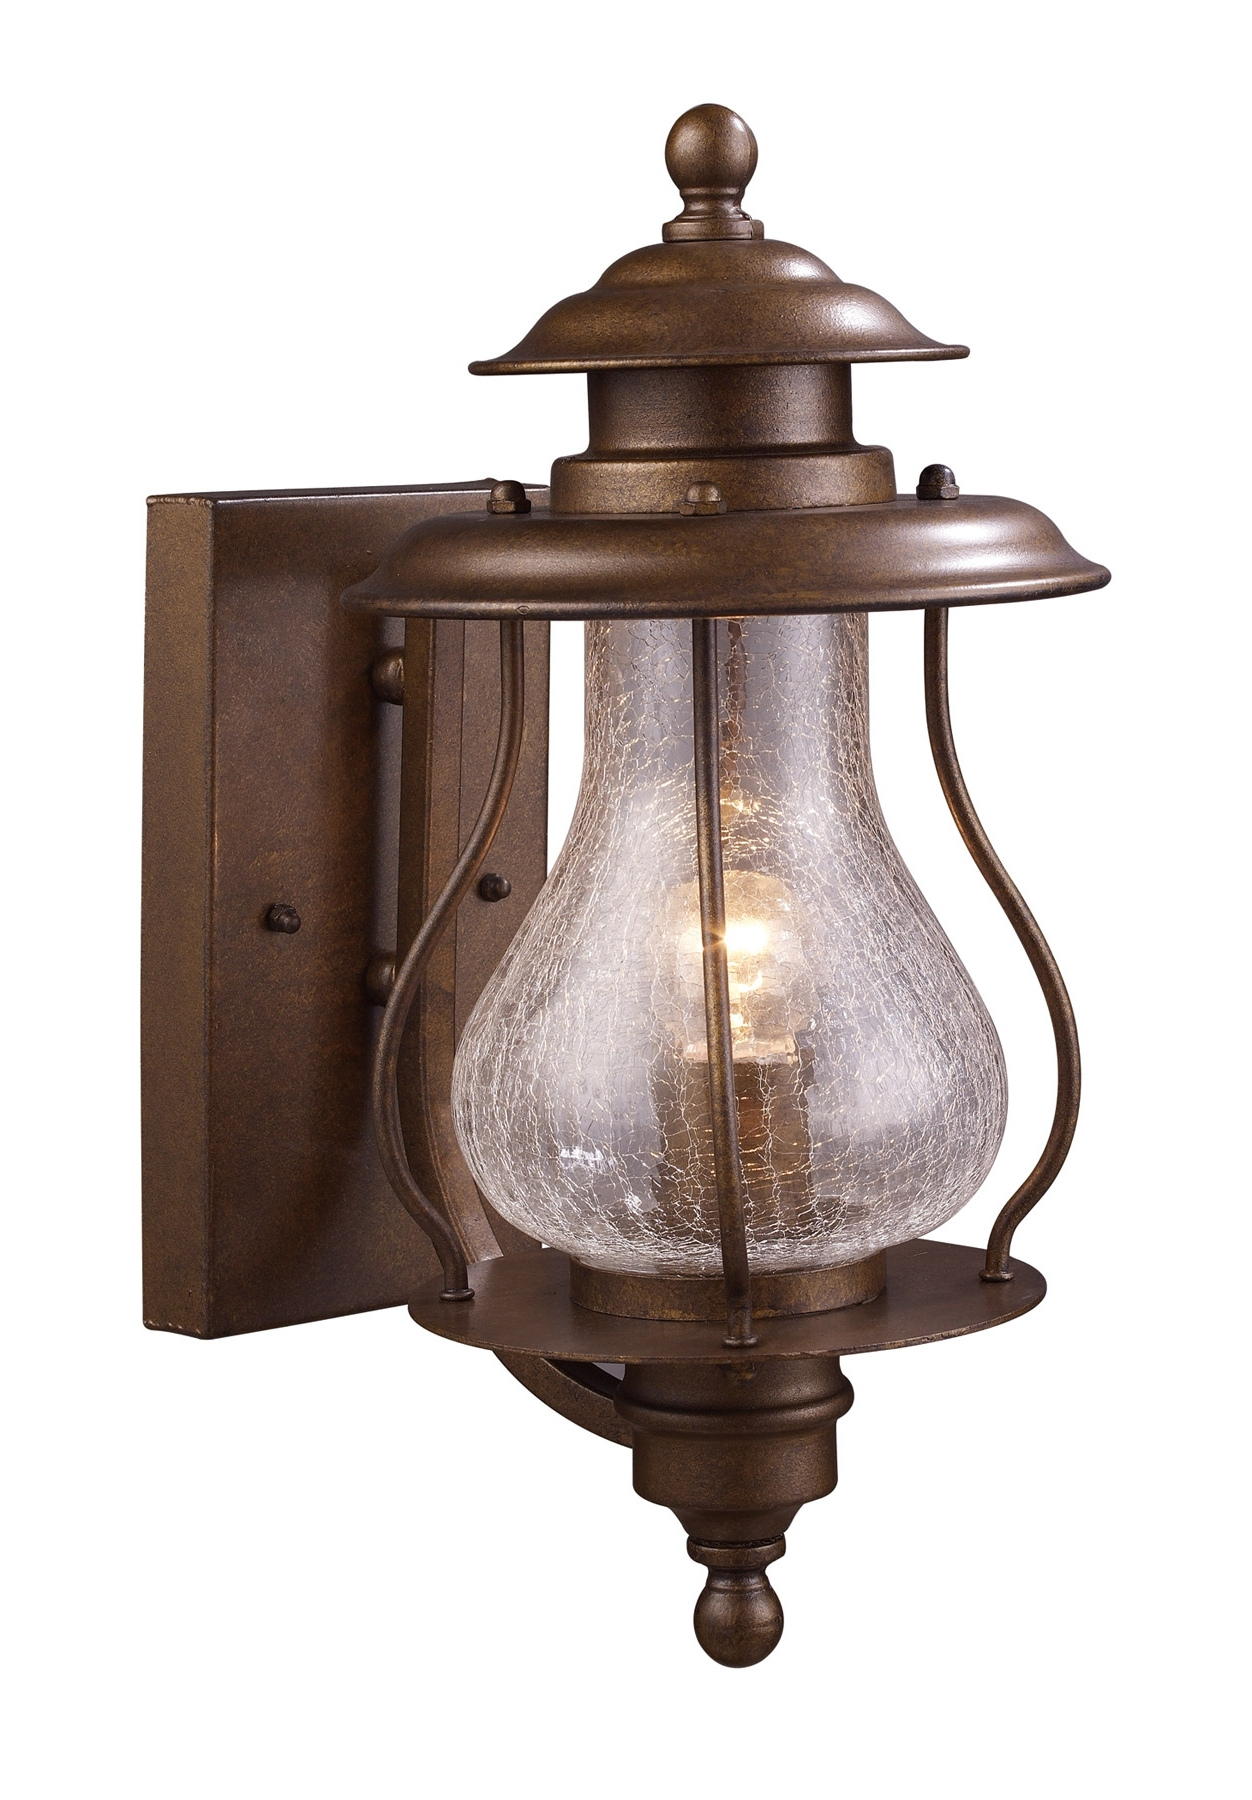 Elk Lighting 62005 1 Wikshire Outdoor Wall Mount Lantern Regarding Popular Outdoor Lanterns Lights (View 5 of 20)